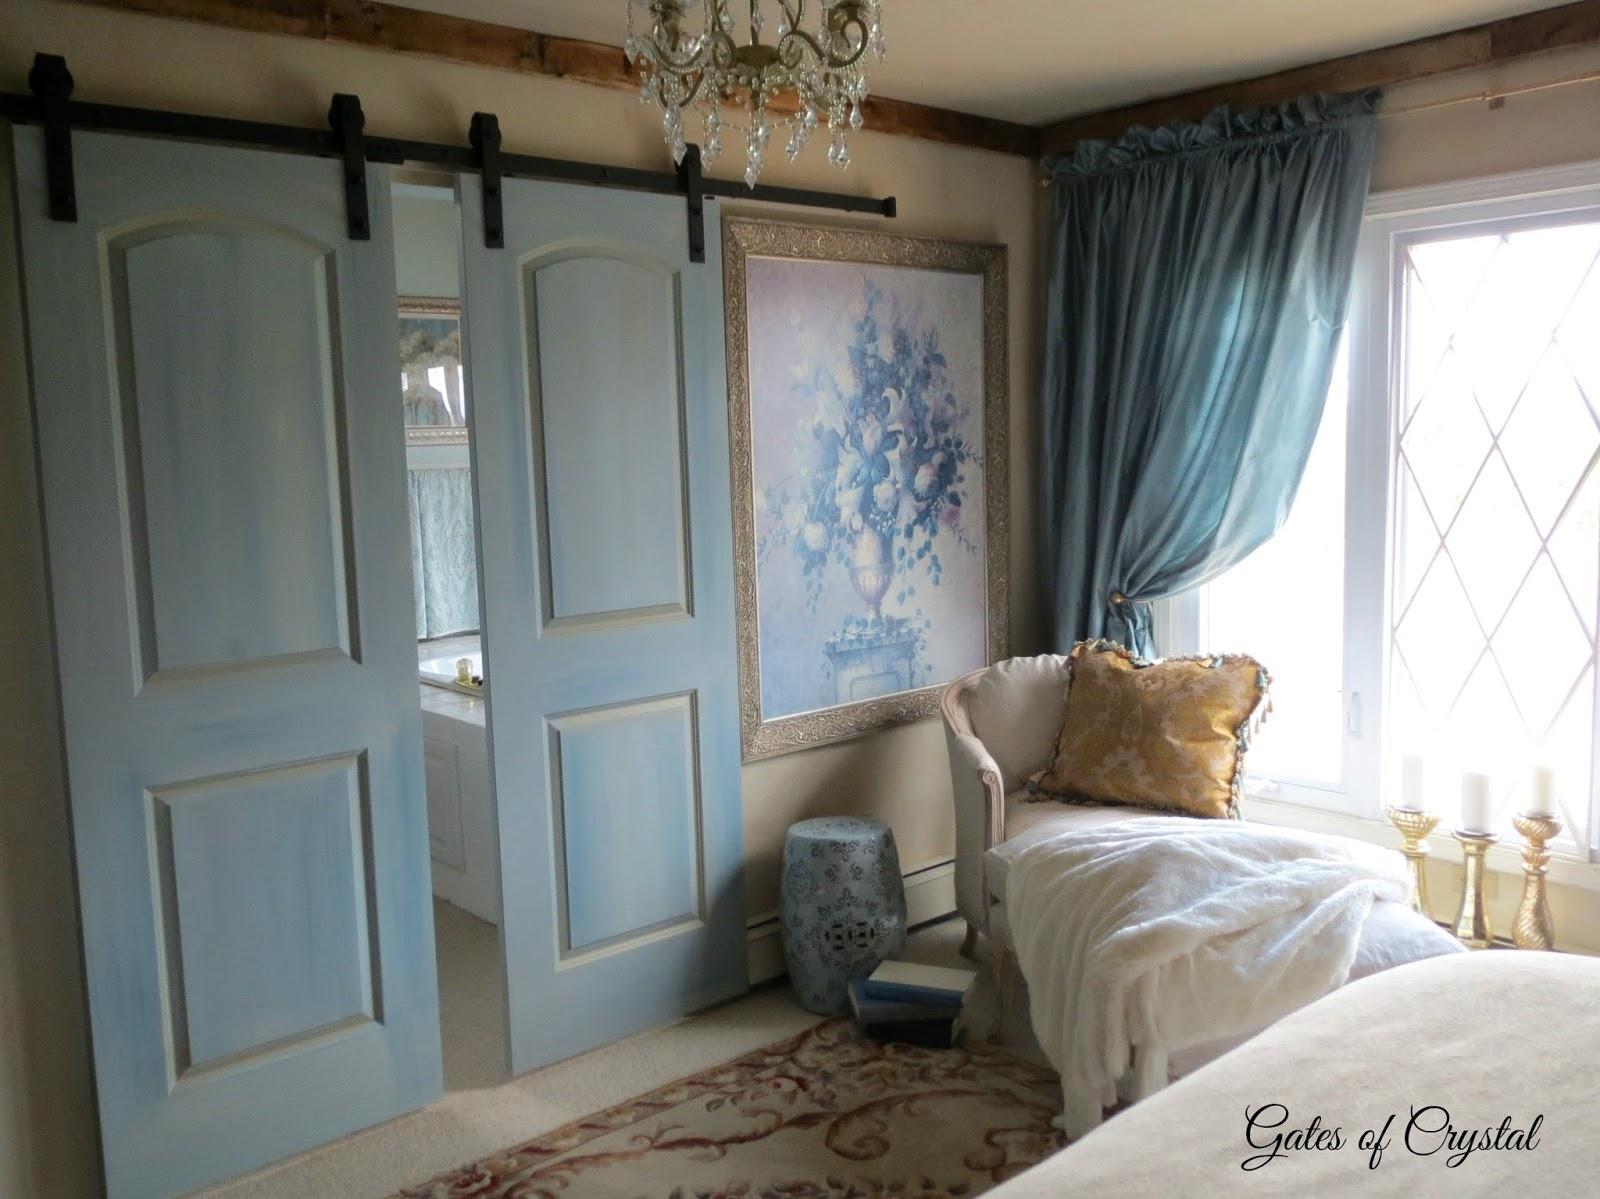 Gates of Crystal: A New Barn Door in the Master Bedroom